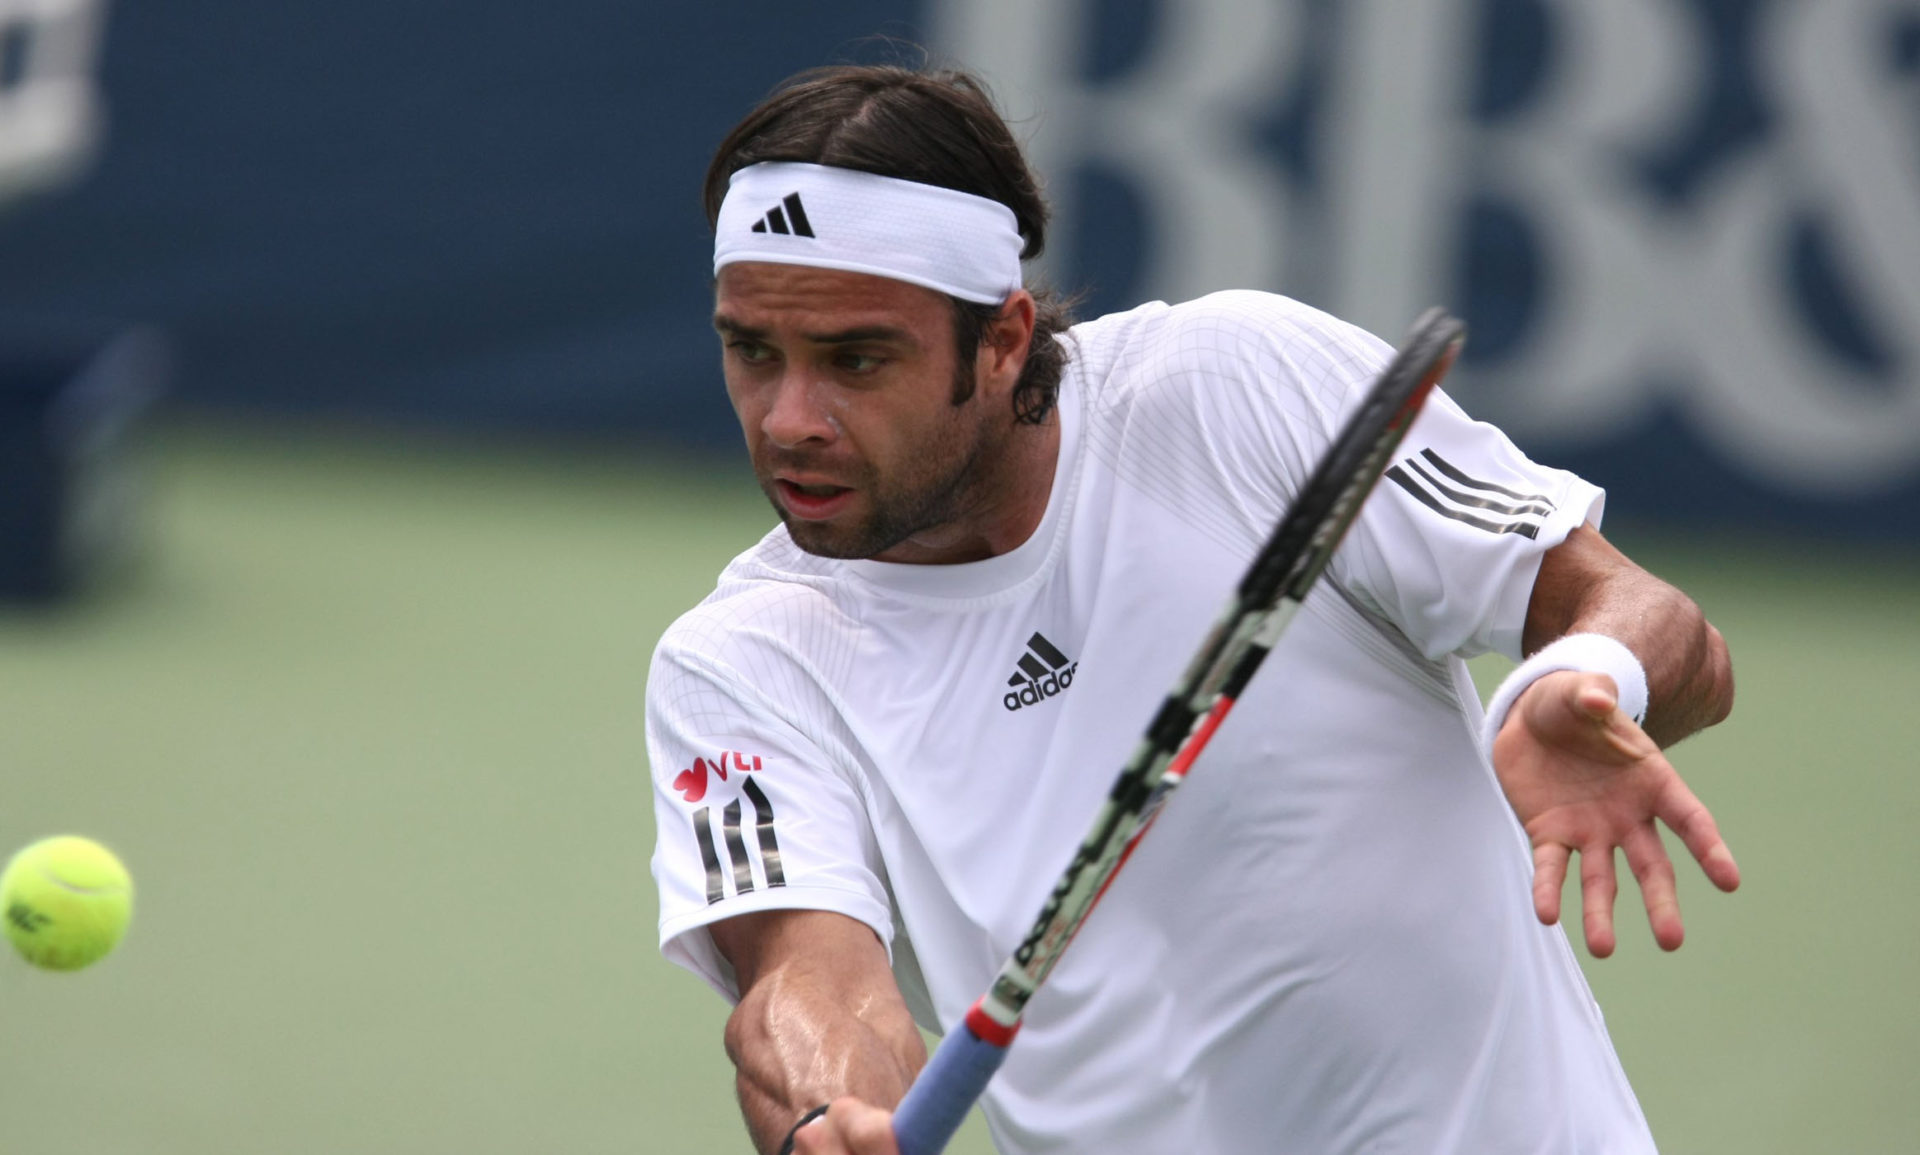 Fernando Gonzalez som aktiv - här i US Open 2009 (Foto: Keith Alison/CC BY 2.0)